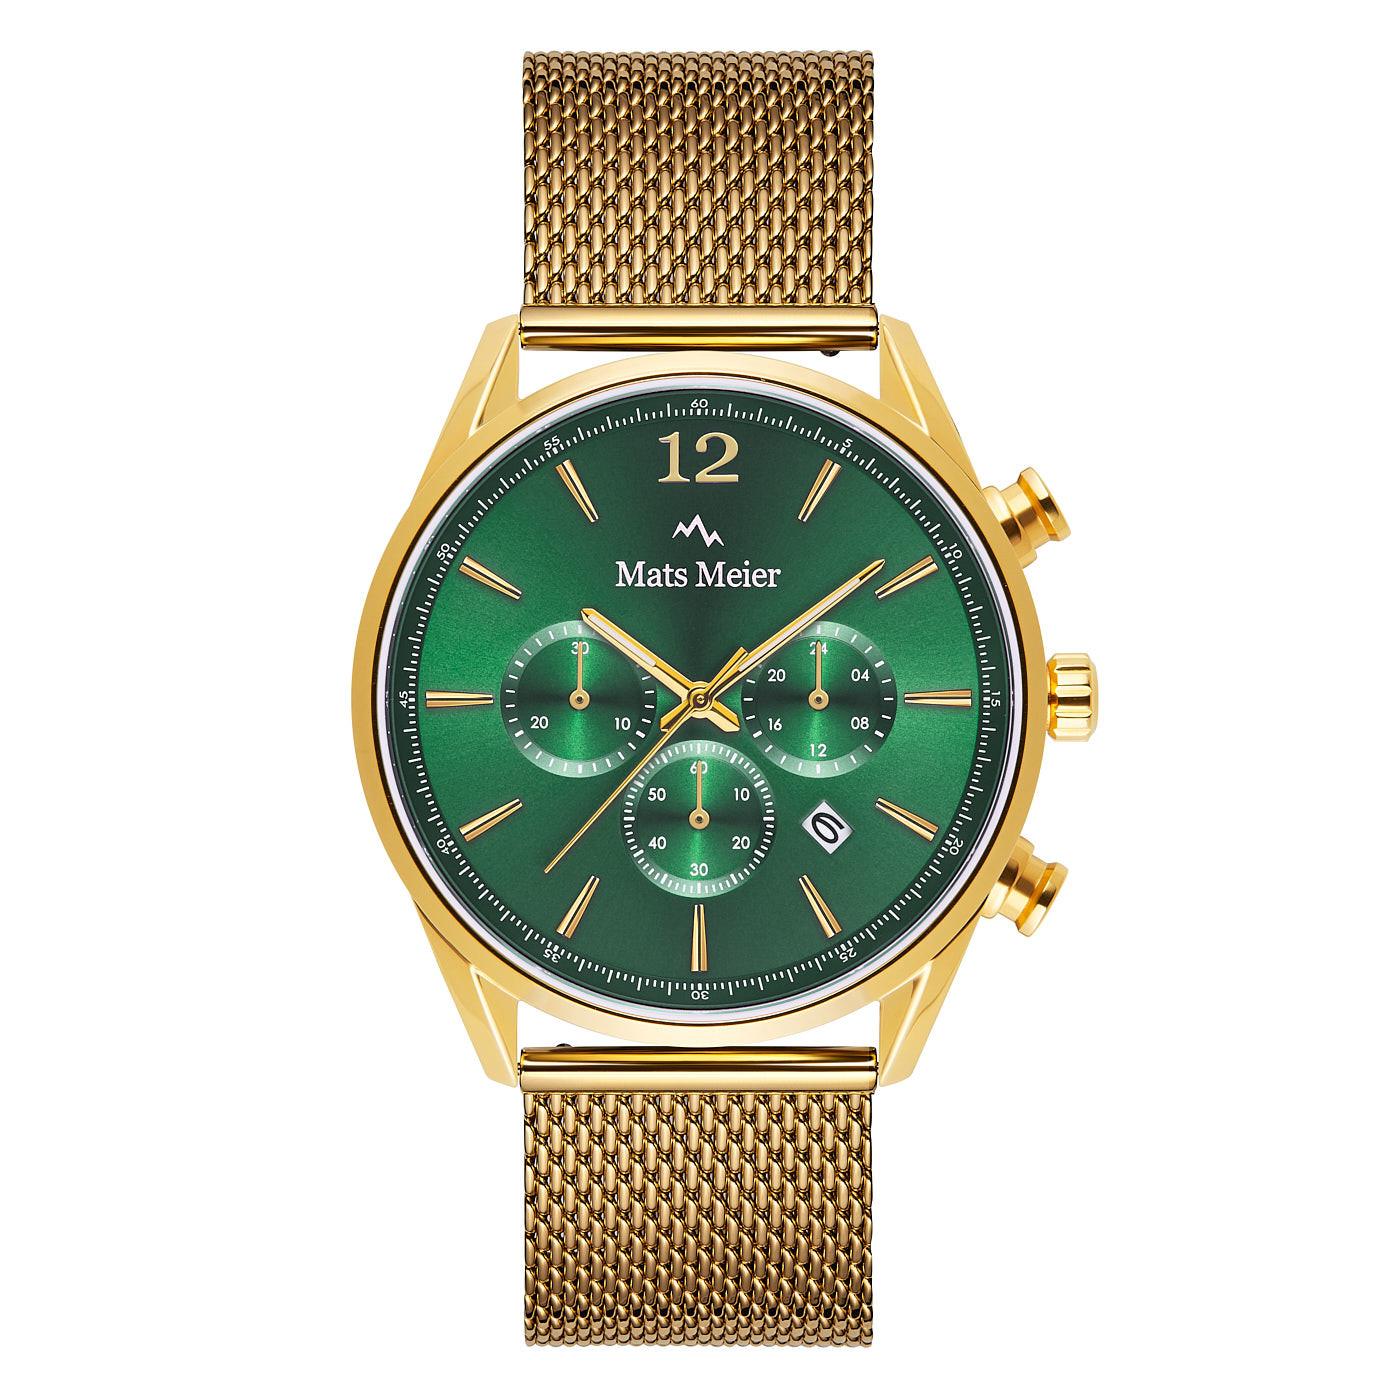 Mats Meier Grand Cornier montre chronographe vert / maille couleur or